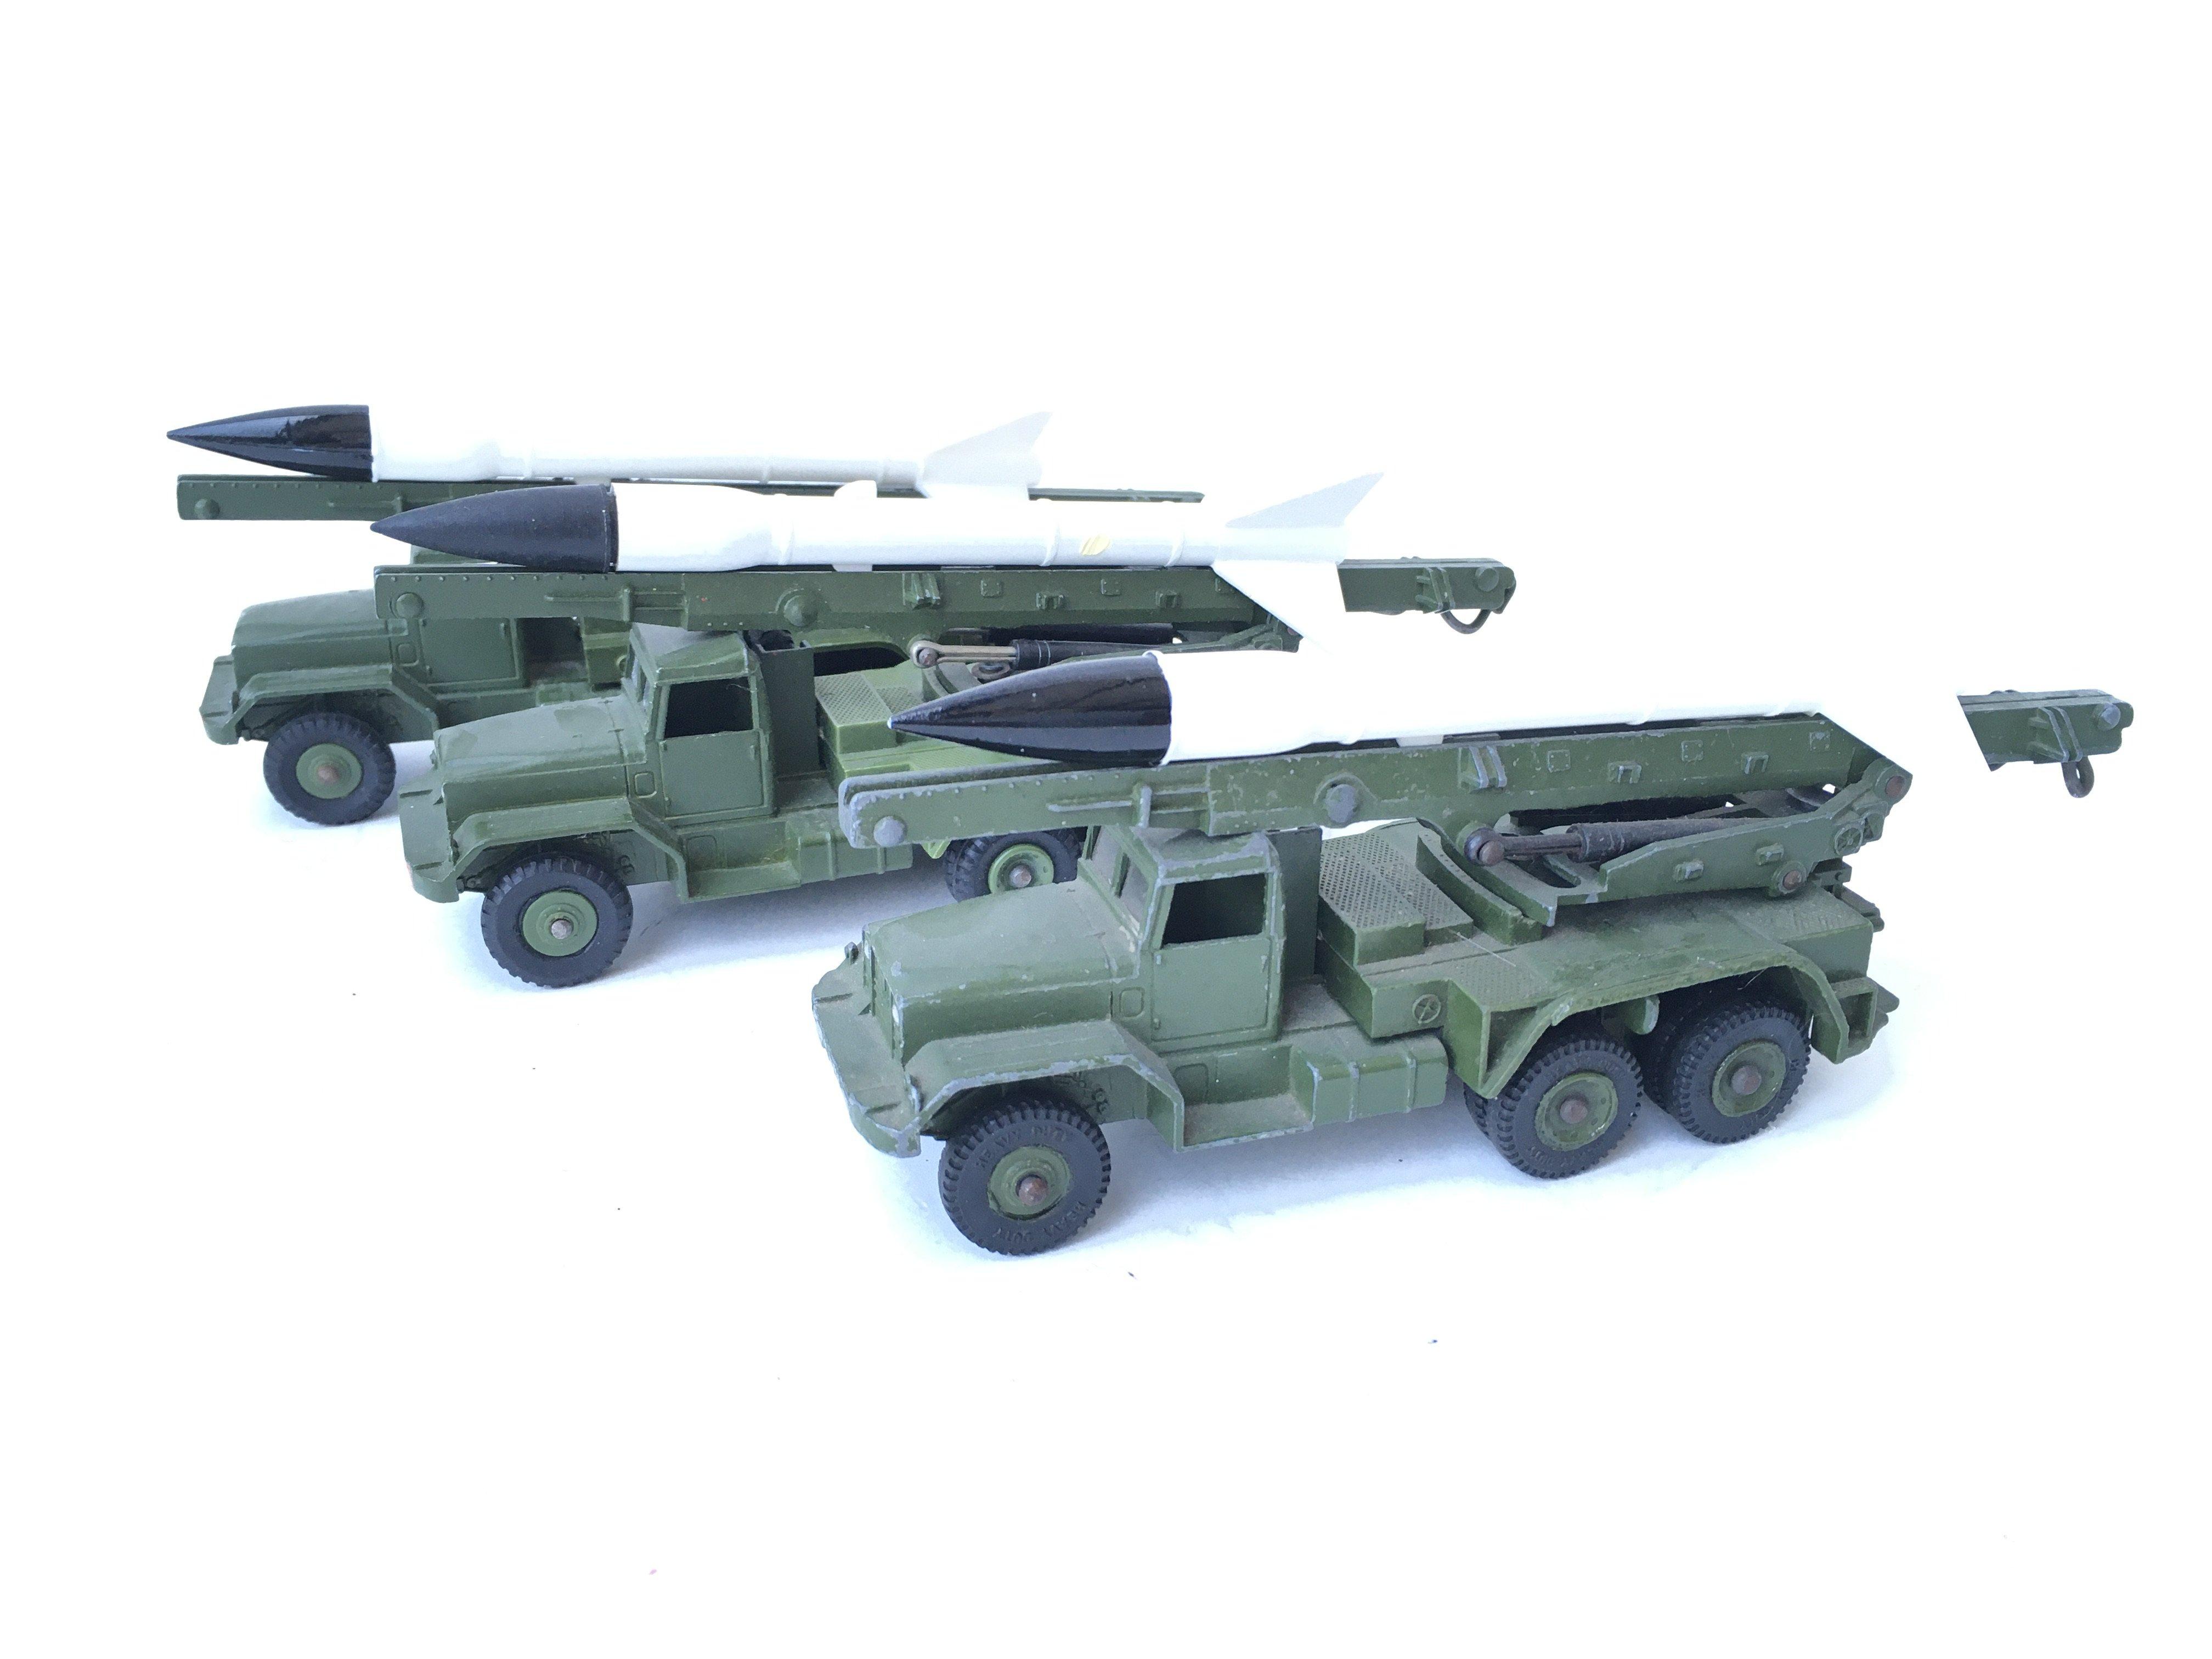 3 X Dinky Supertoys Honest John Rocket Launchers.